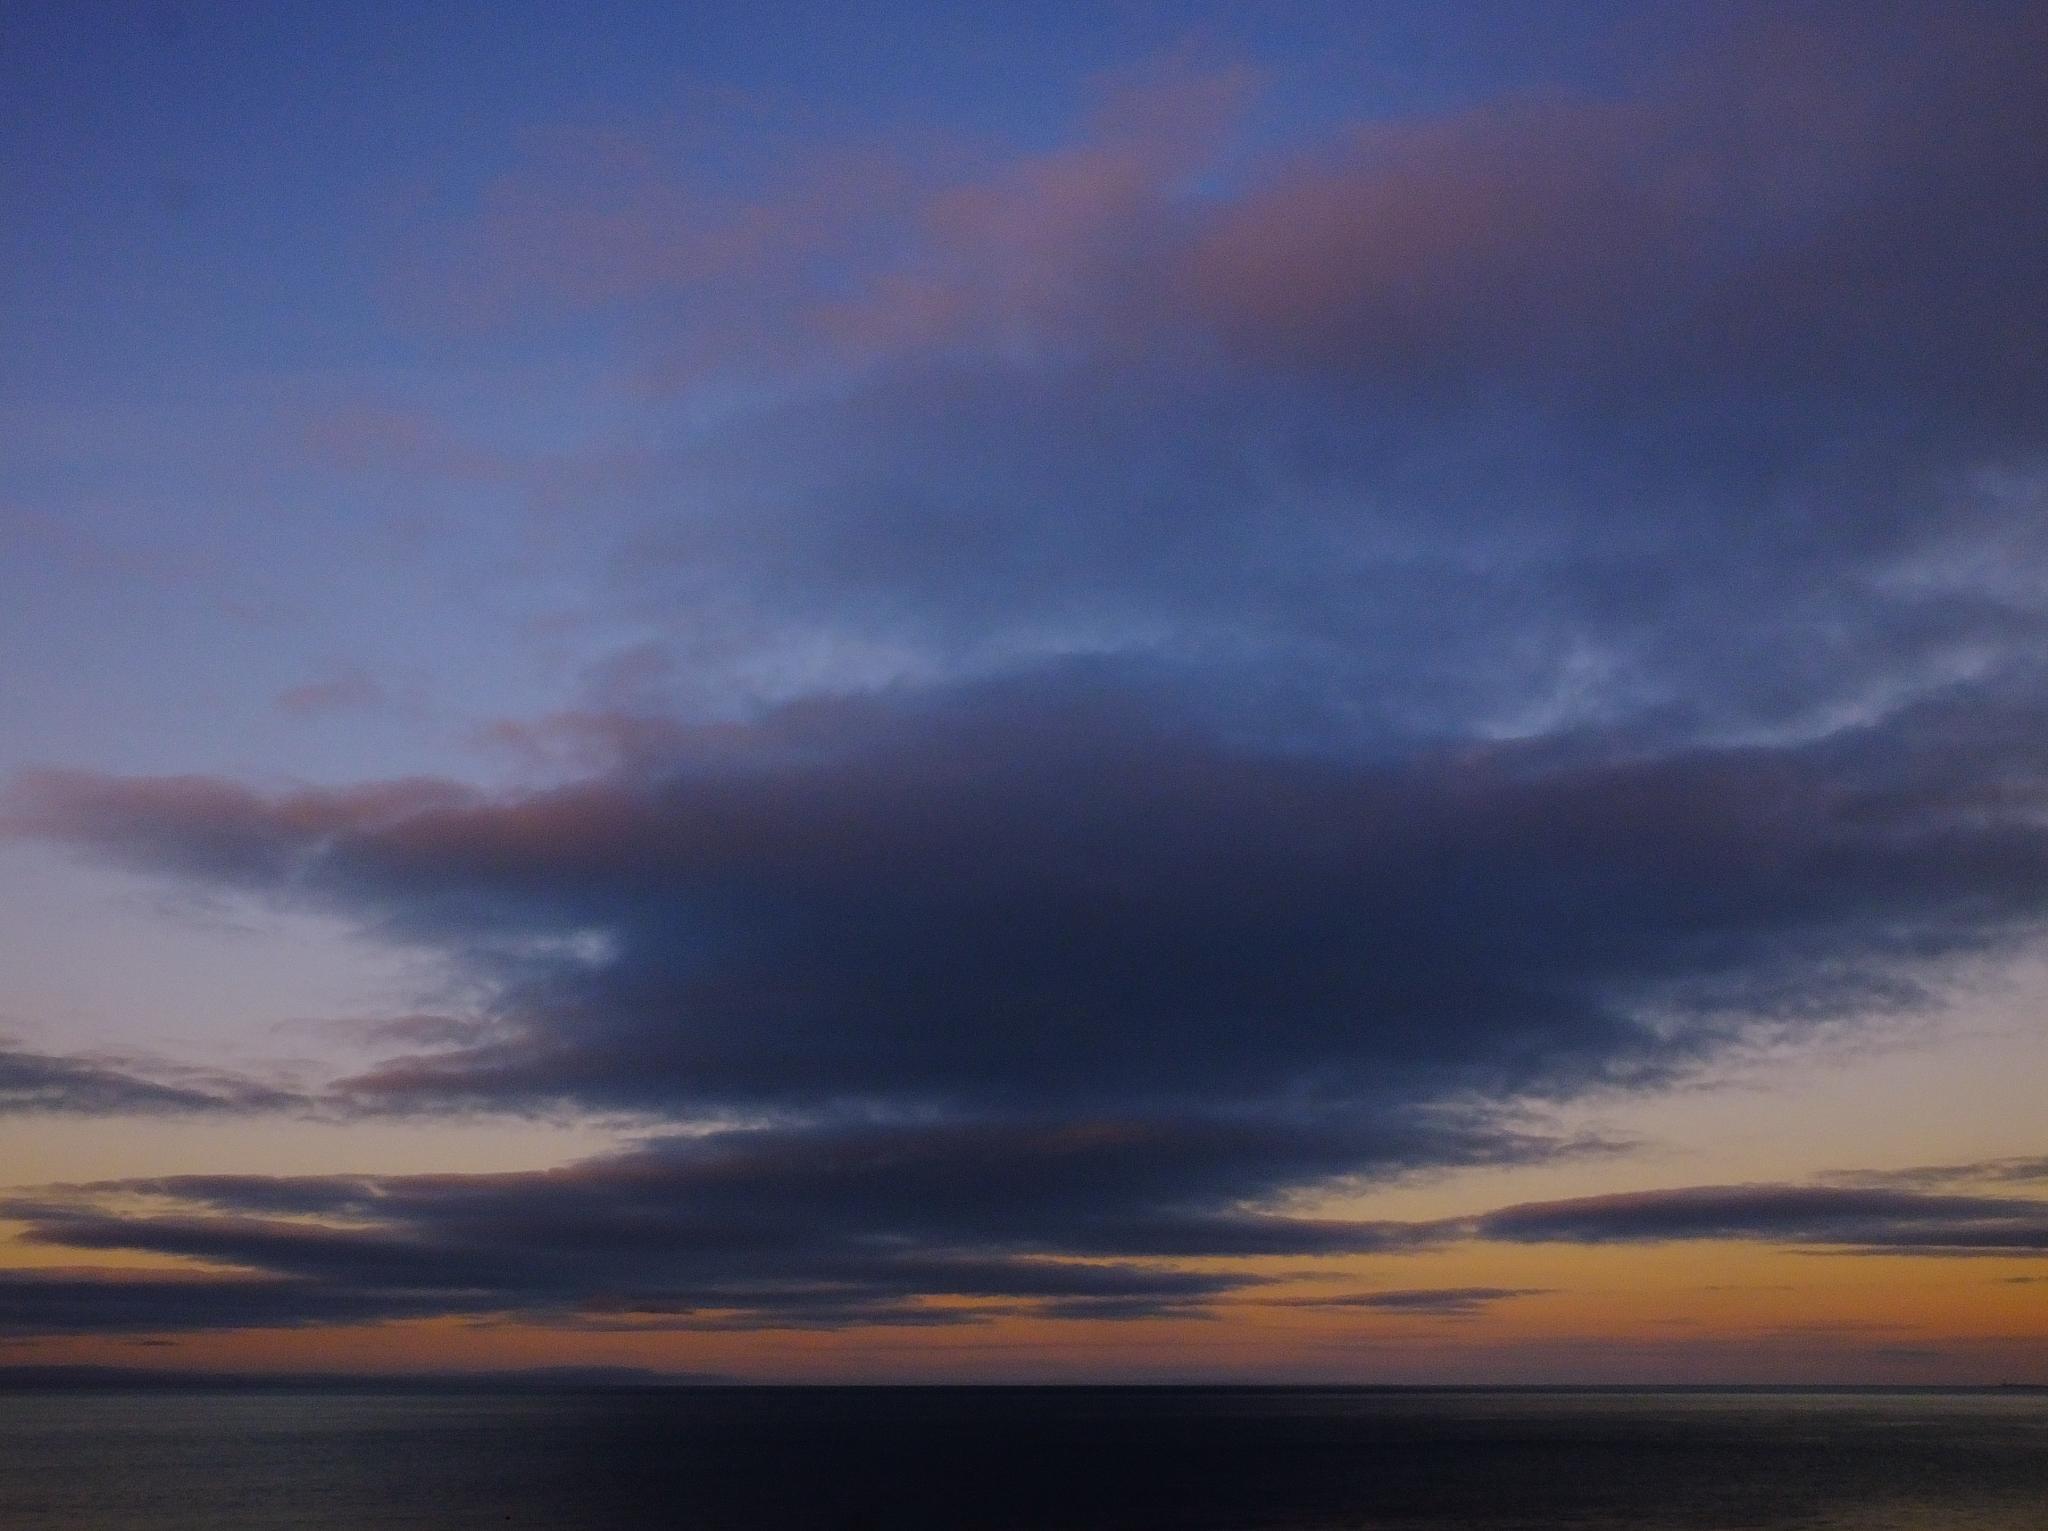 Calm Irish Sea at Dusk by andy.morrow.315